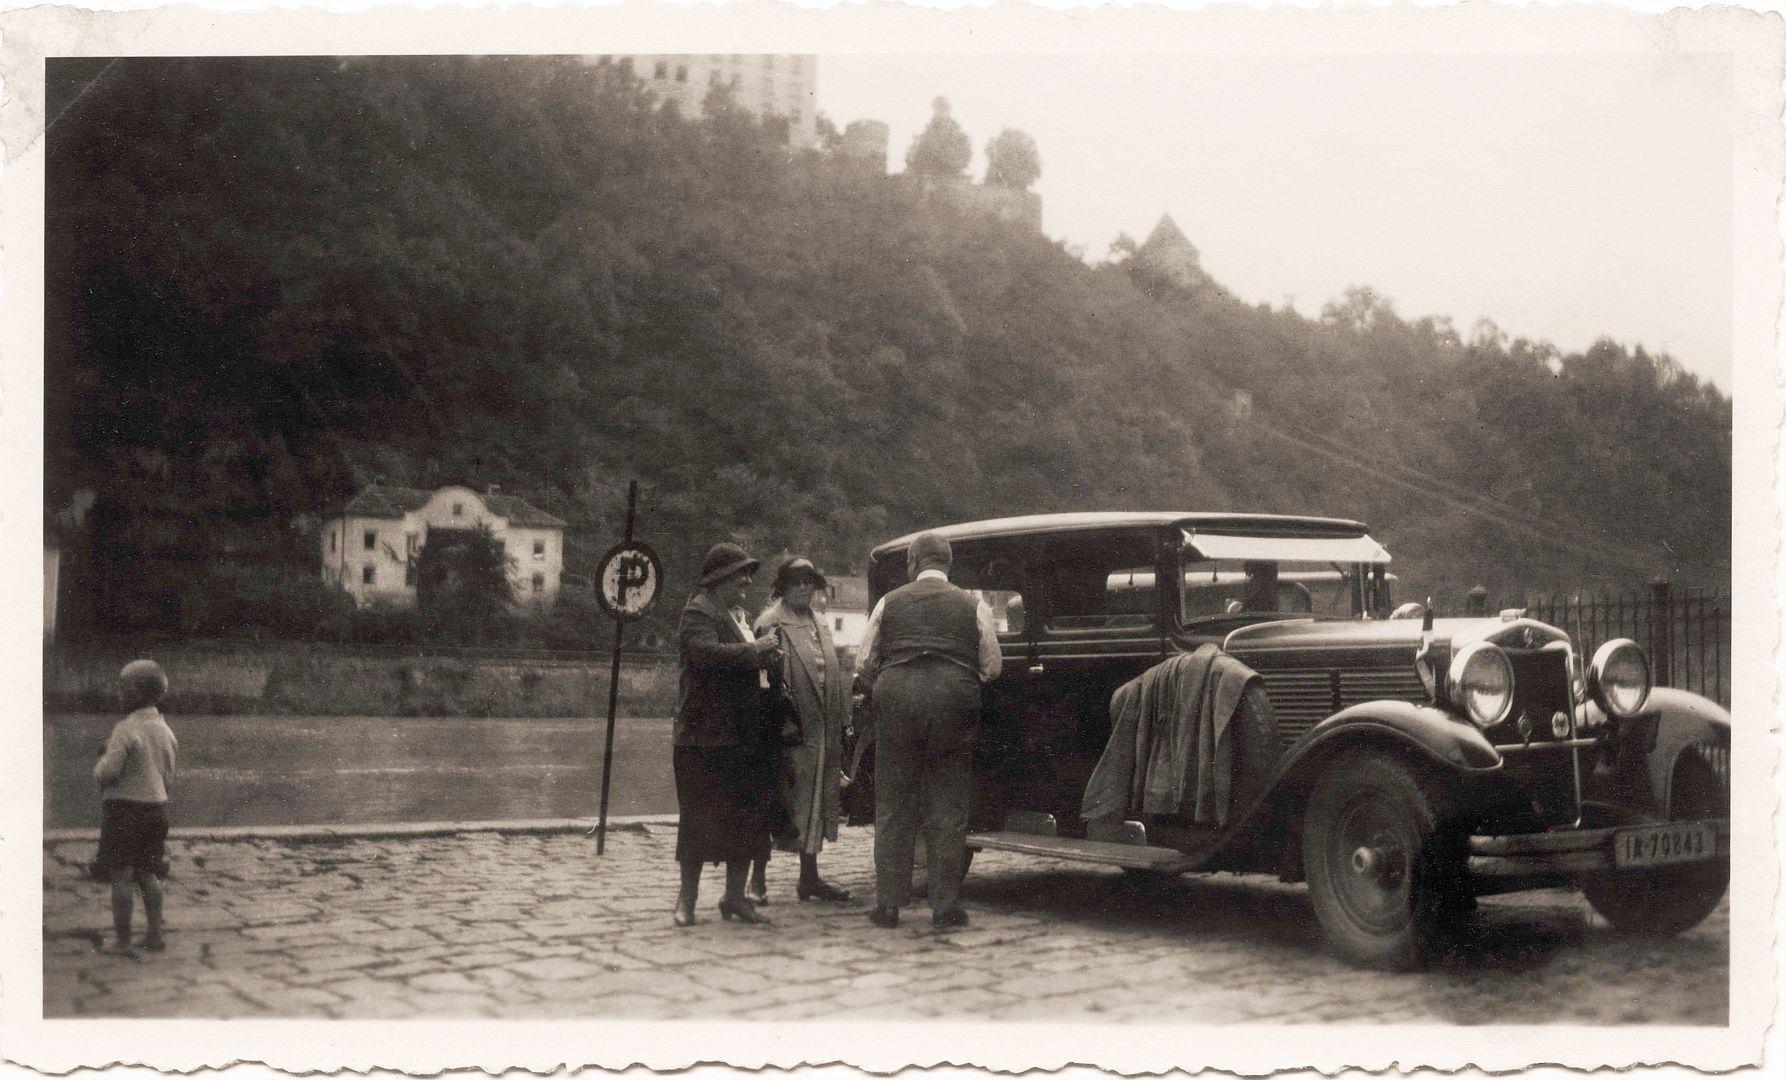 nag-protos_typ_204_14-70_ps_passau_juli_1932_galerie